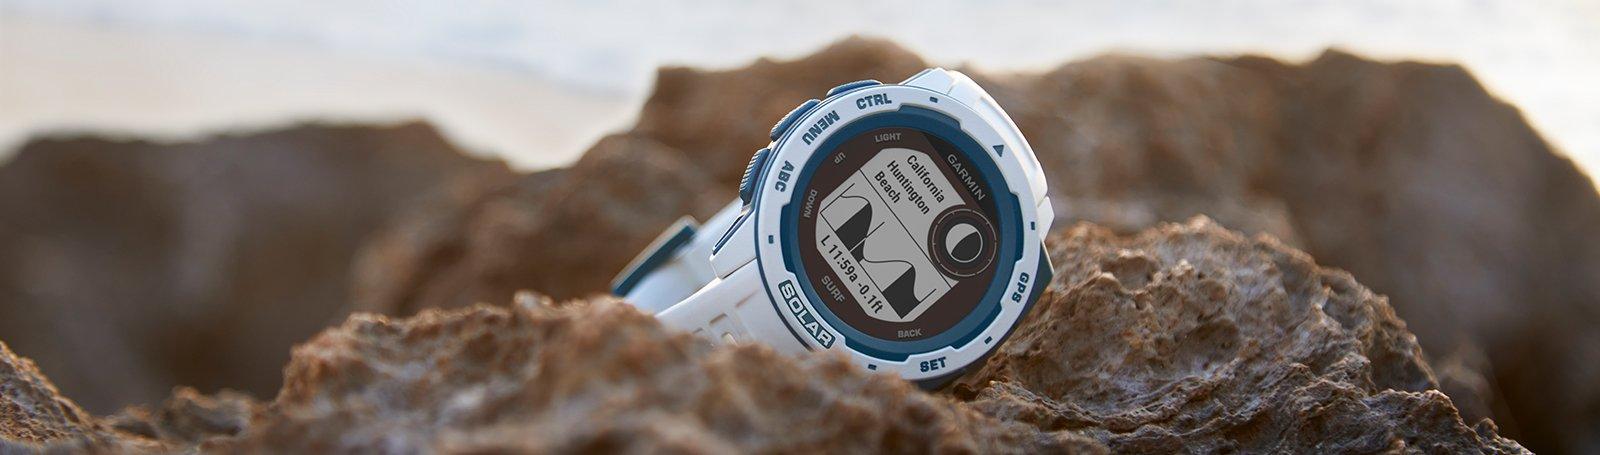 Garmin 戶外運動腕錶